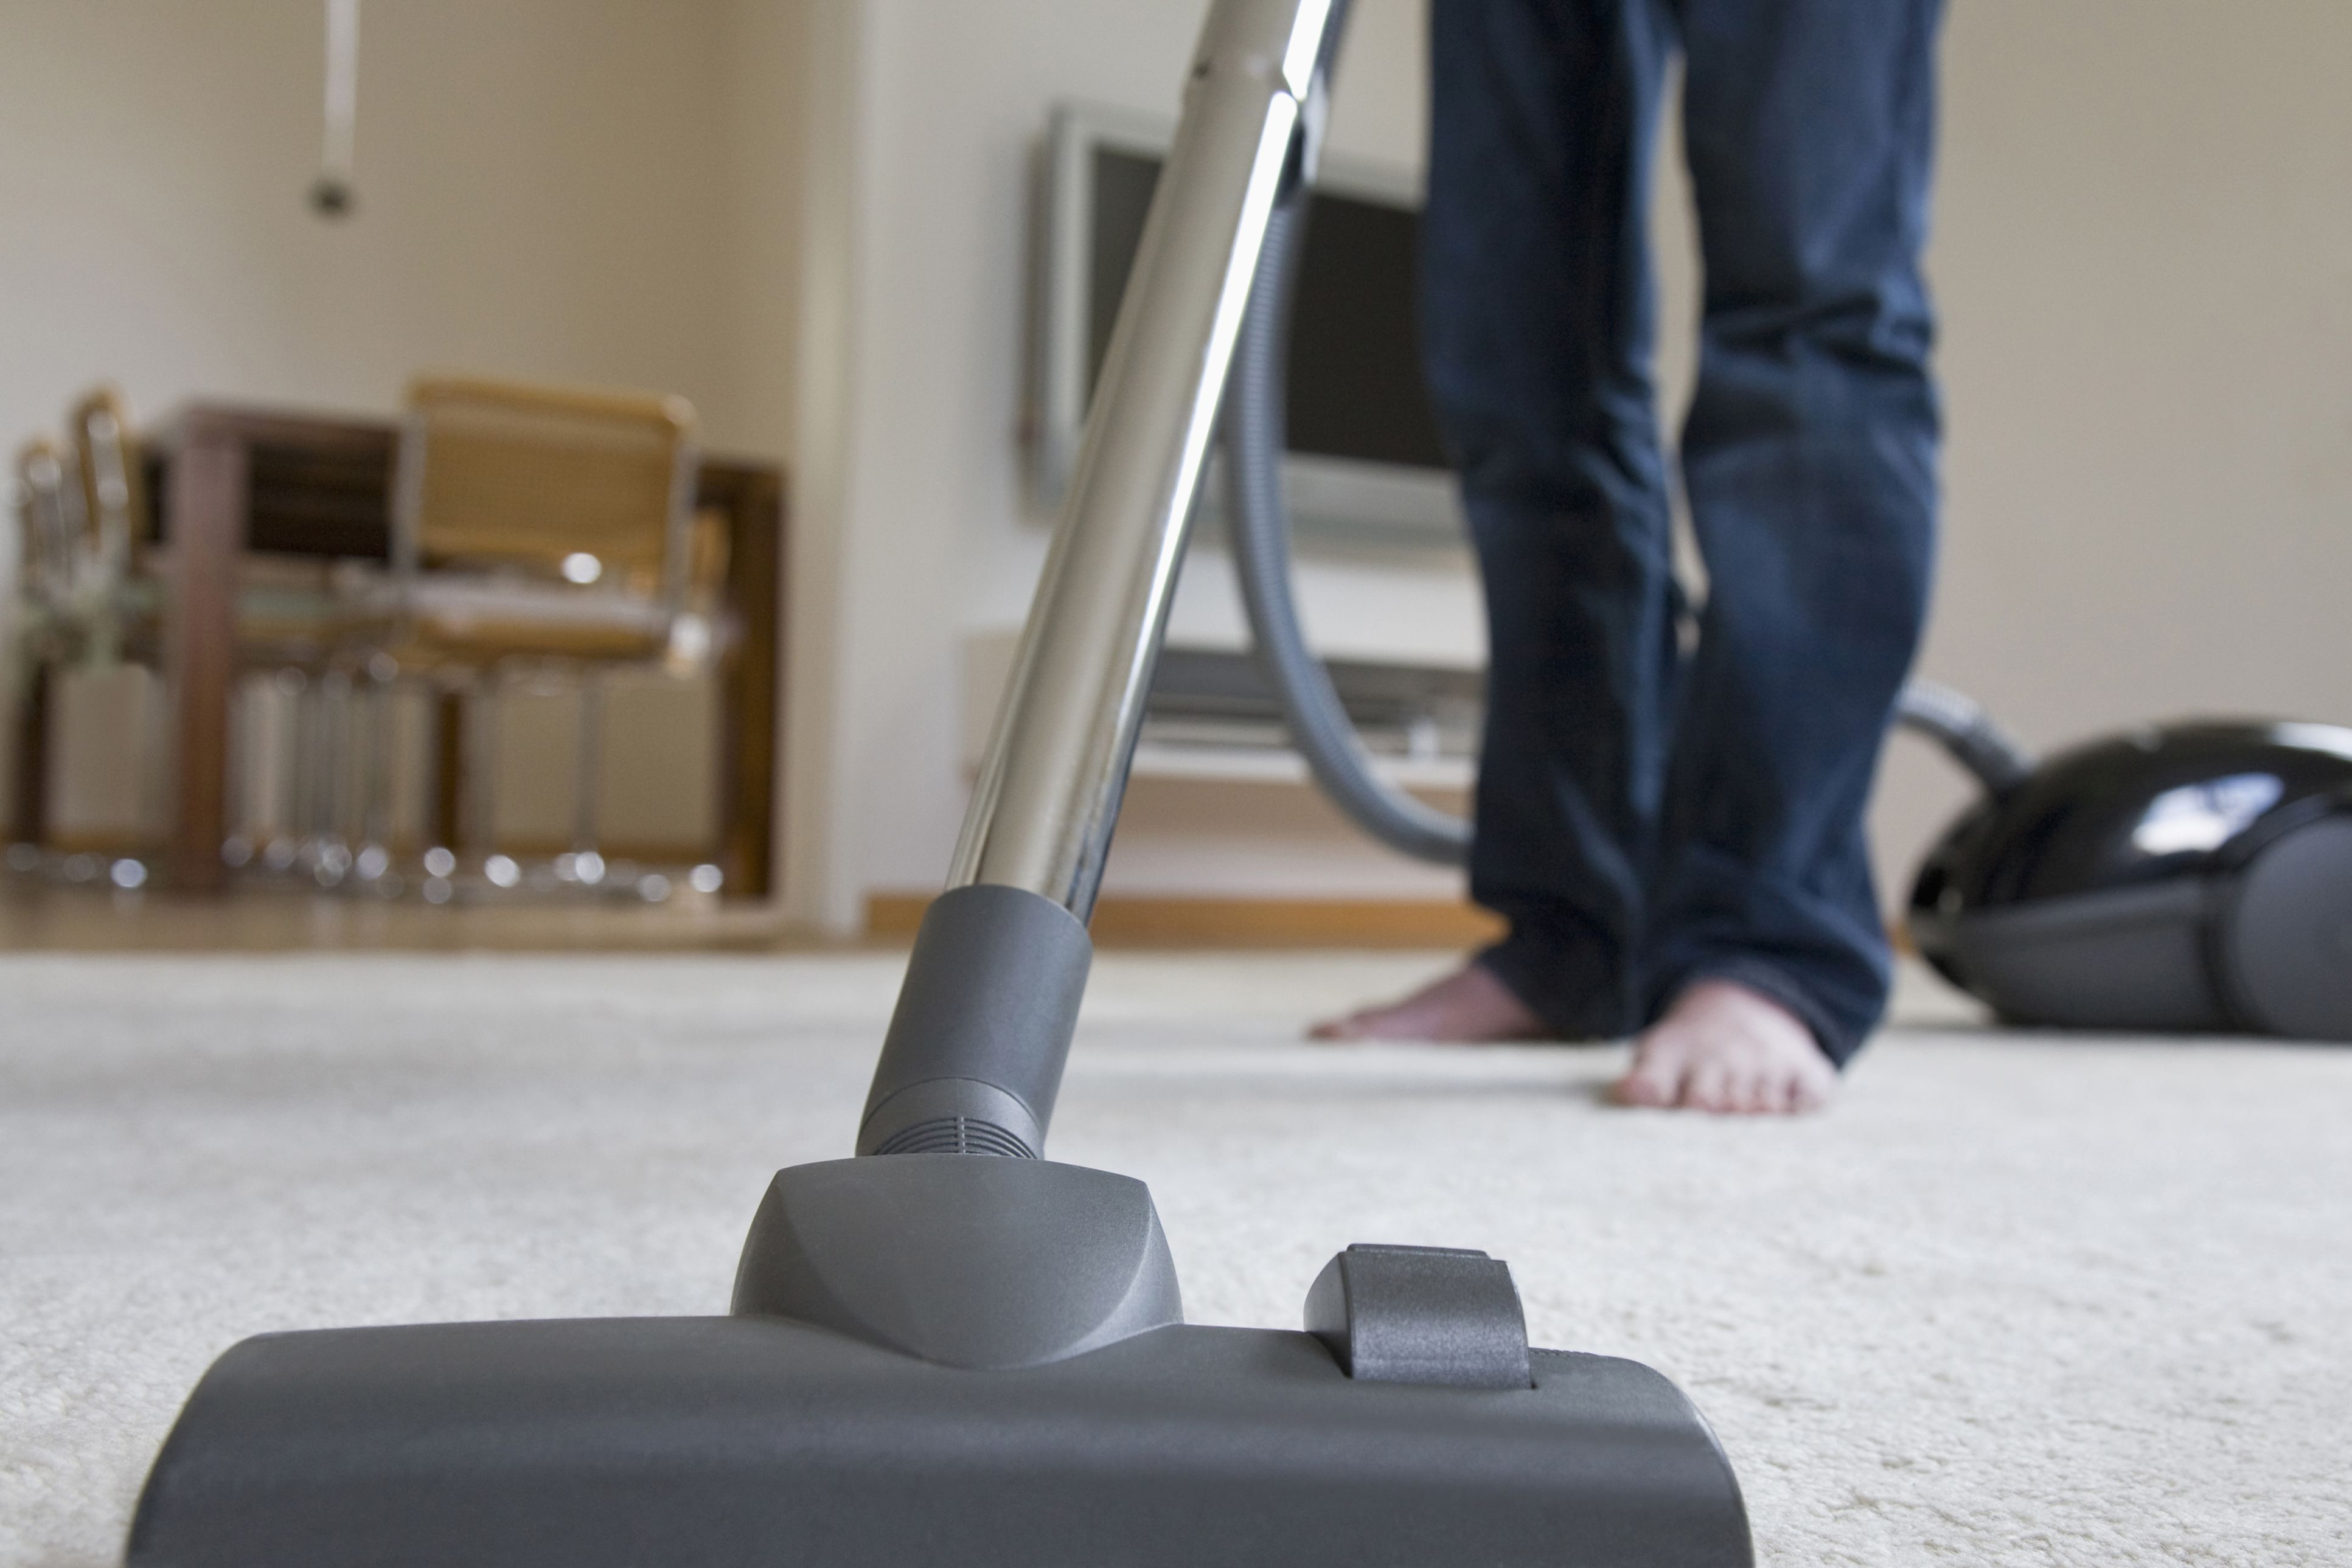 25 Elegant Hardwood Floor Pet Vacuum 2021 free download hardwood floor pet vacuum of the right vacuum for smartstrand and other soft carpets regarding vacuuming carpet 56a812a93df78cf7729be1cb